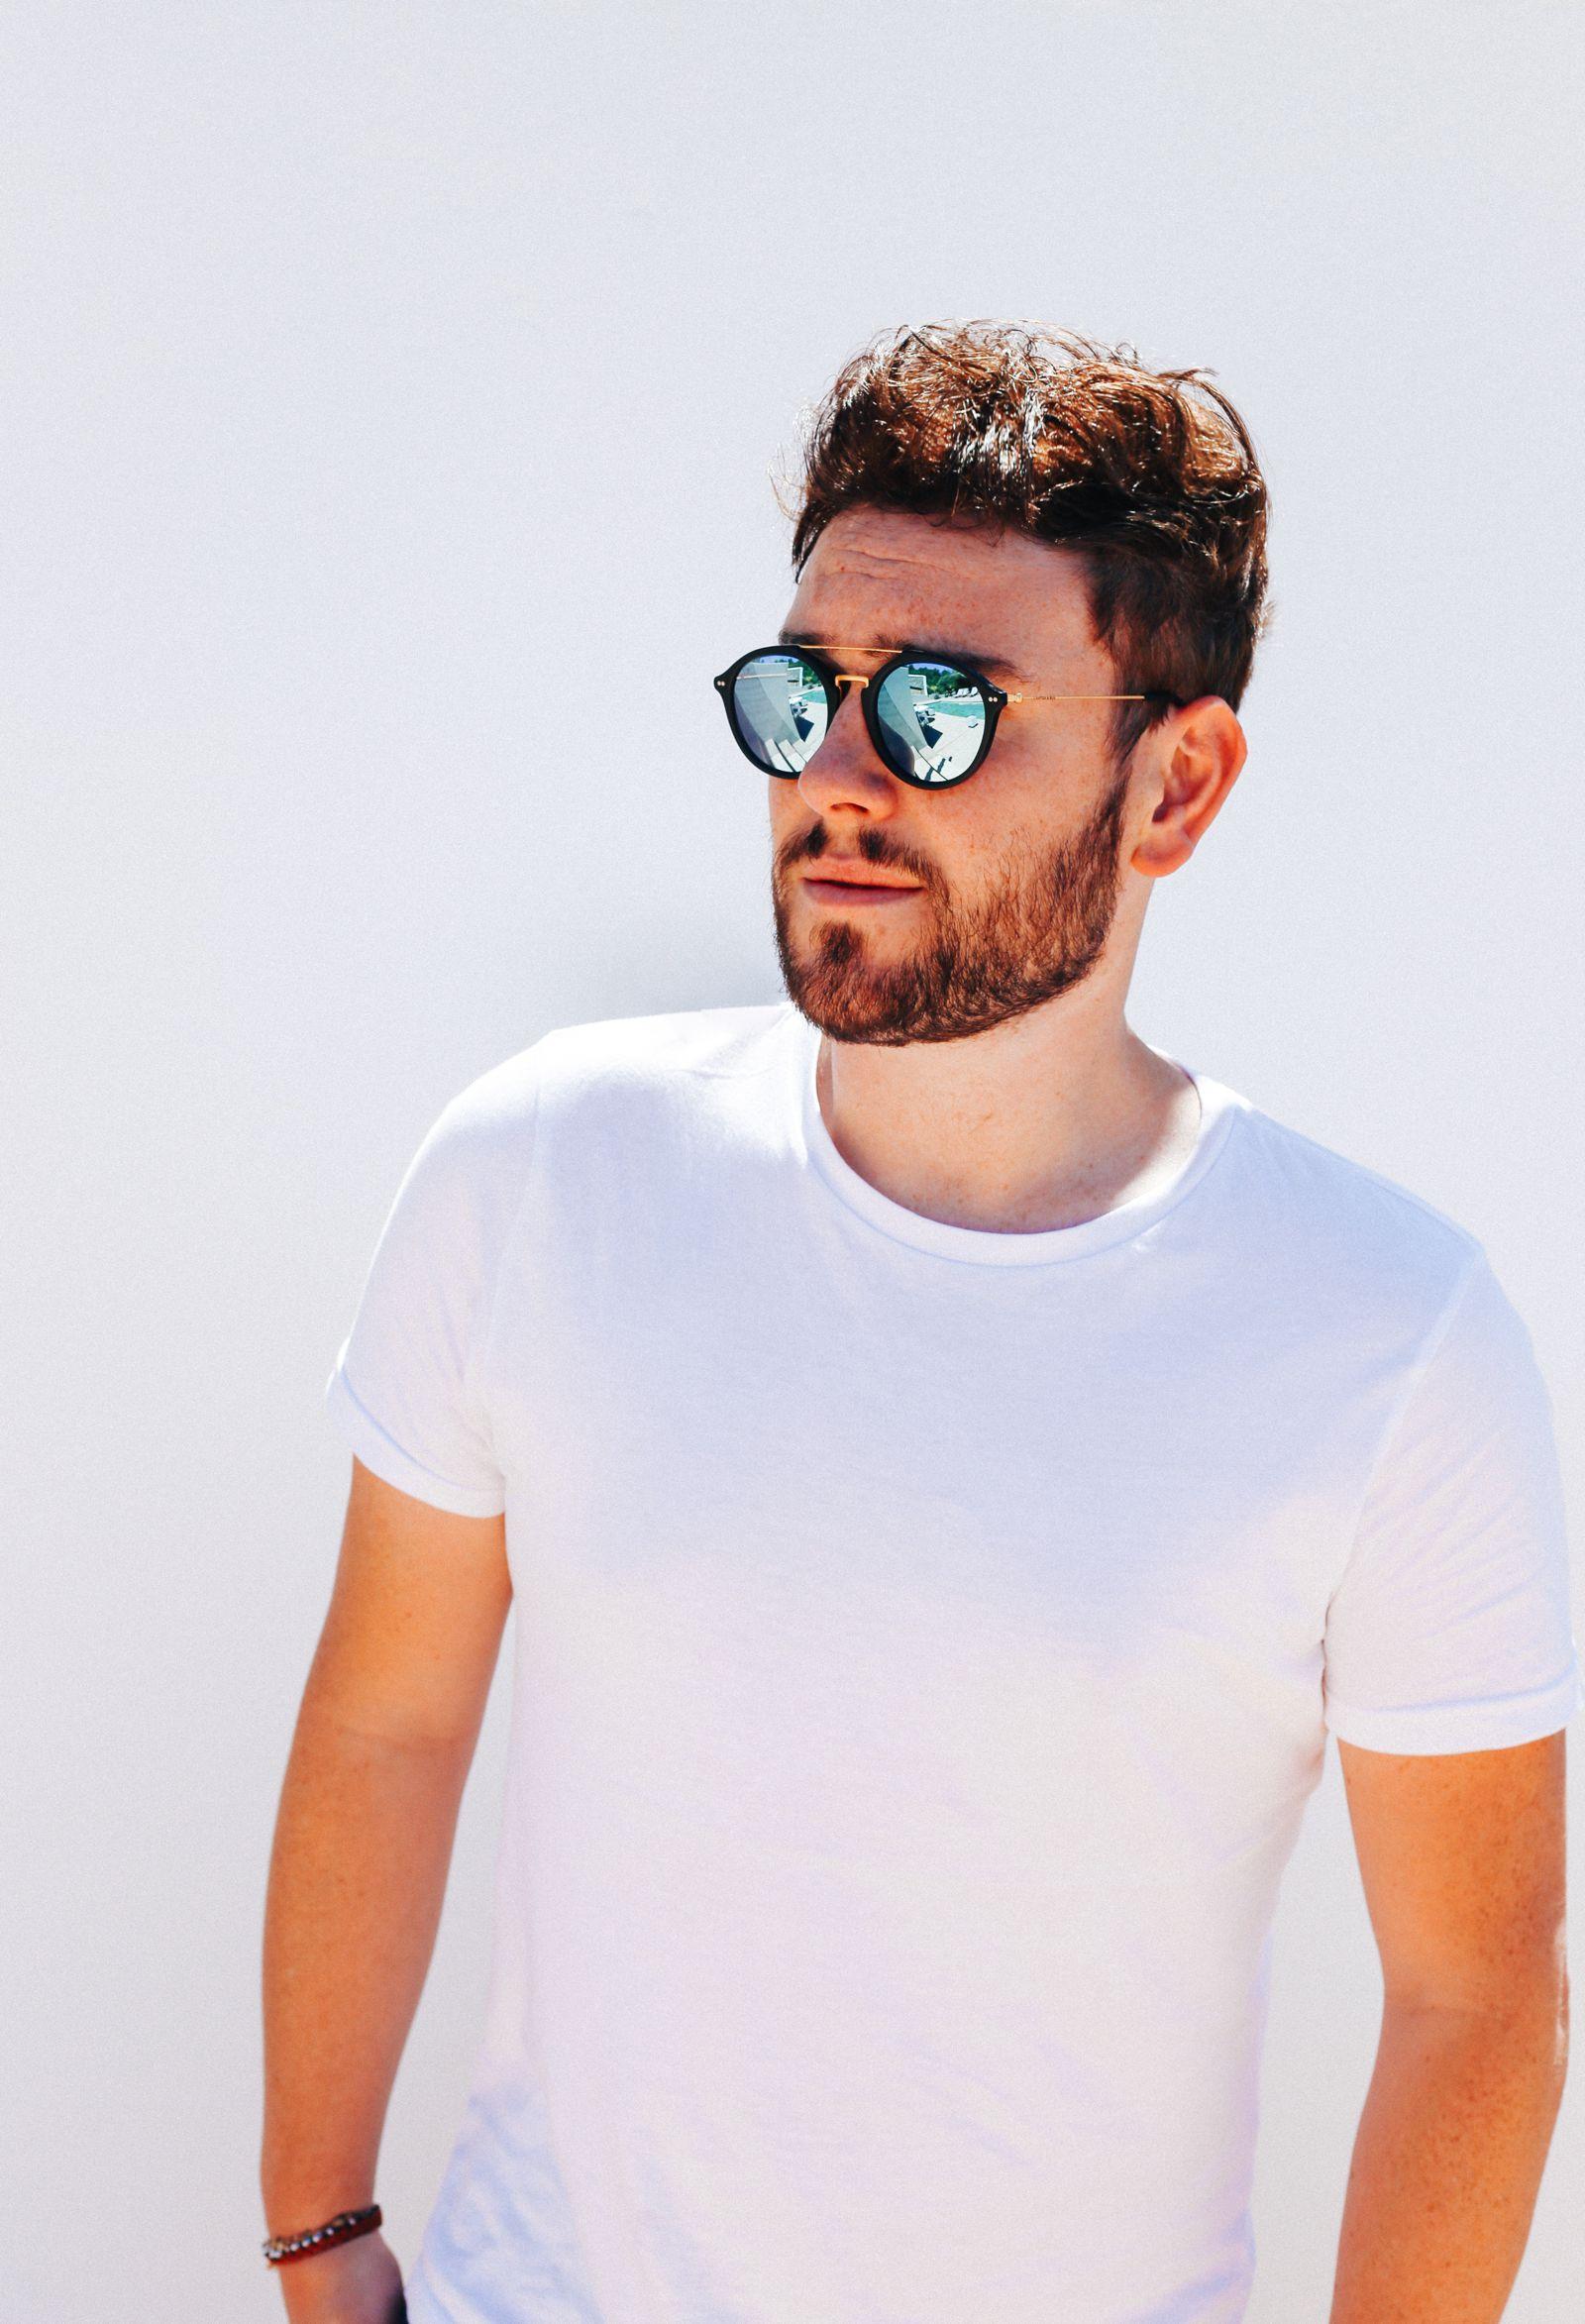 Ibiza Summer Fun In The Sun with Kapten & Sons (16)